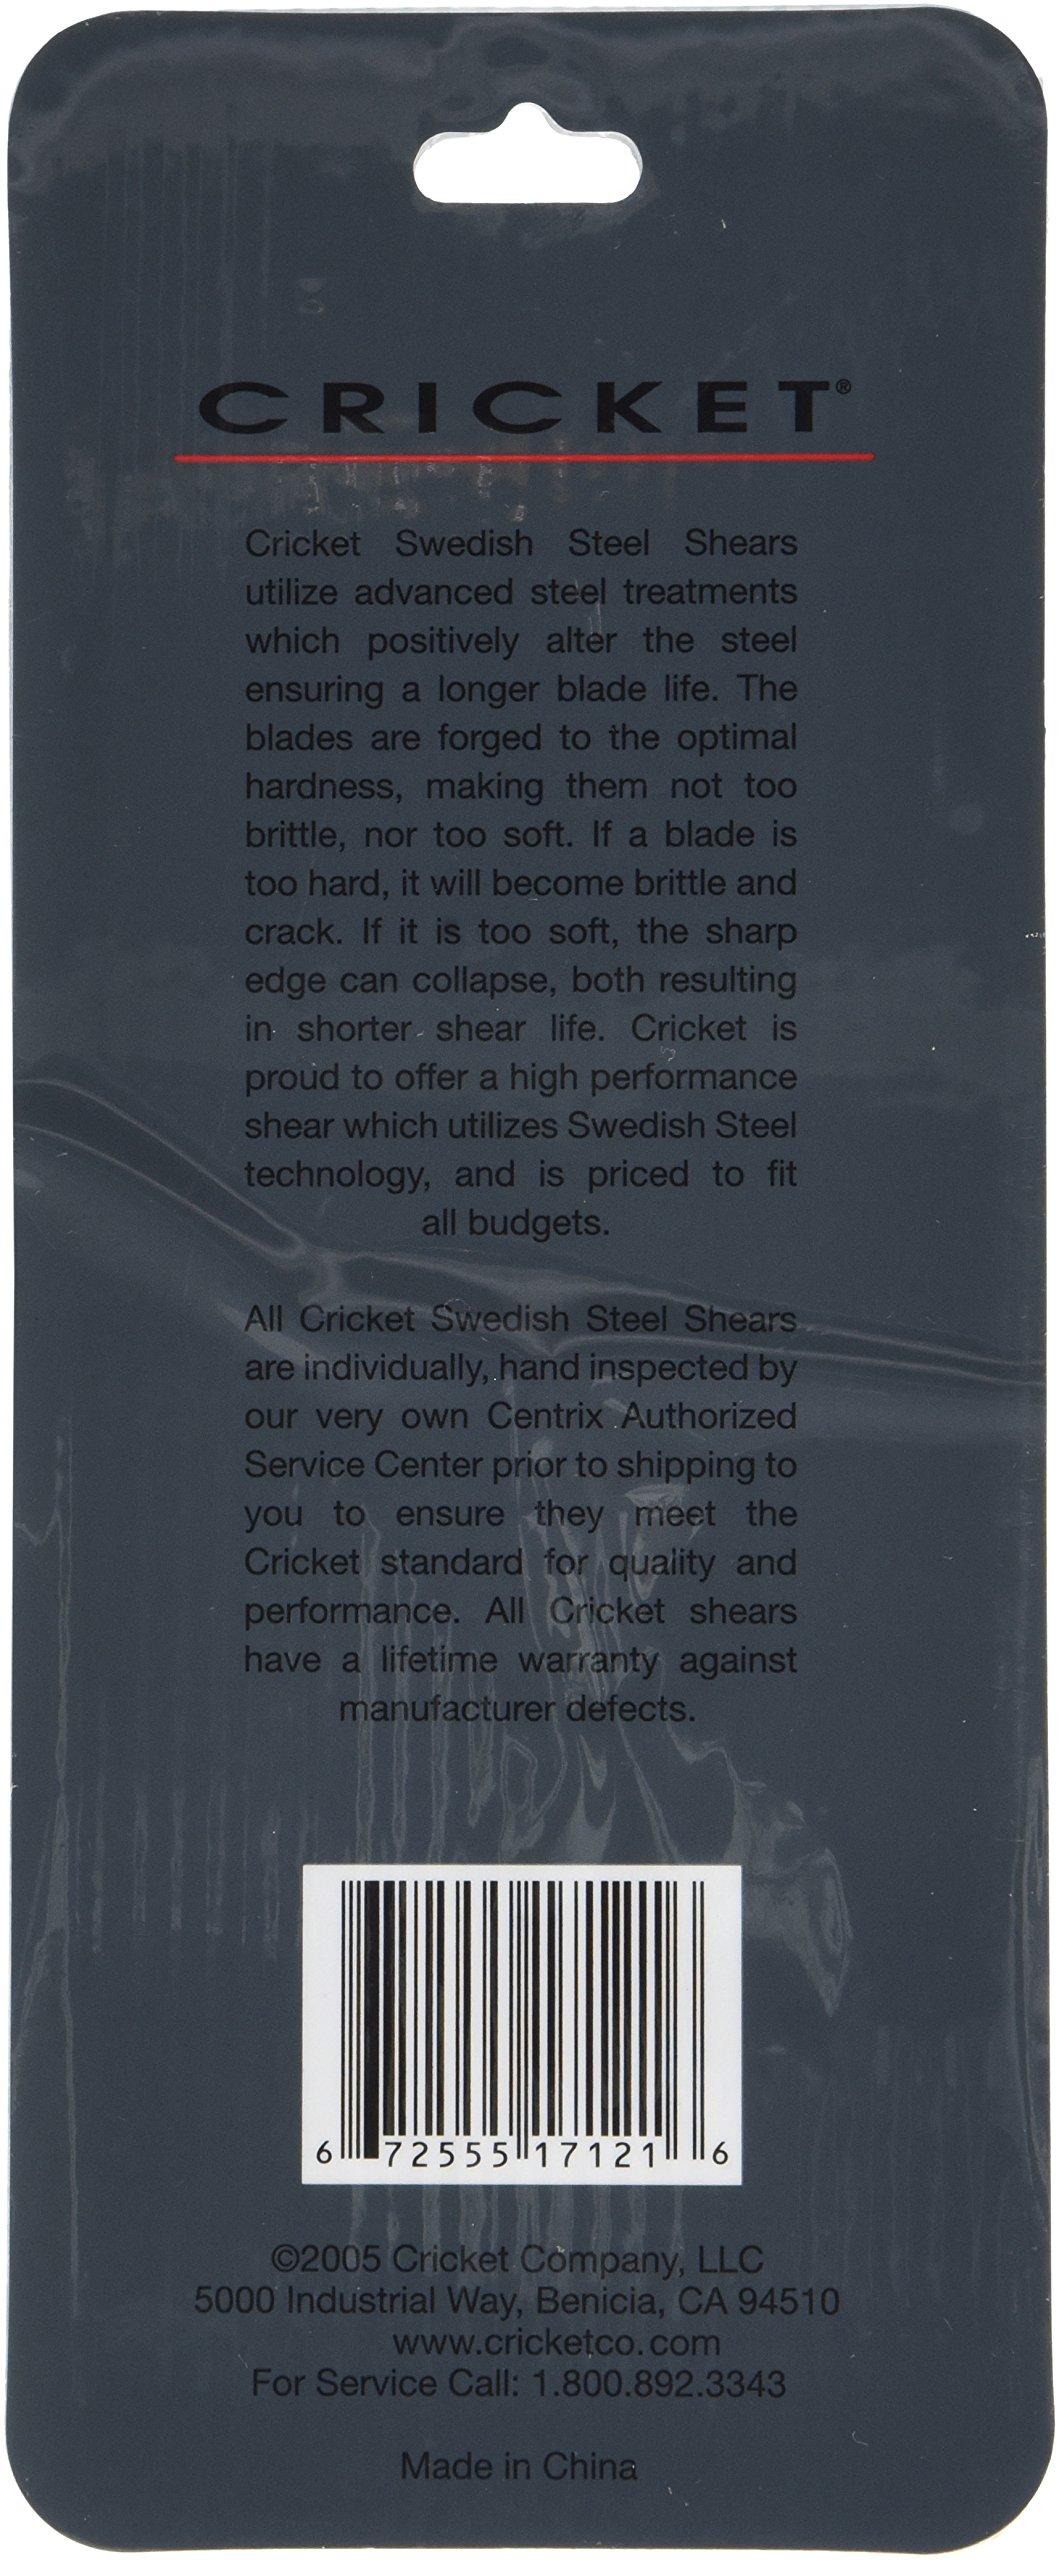 Cricket S-3 500 Carded Professional Hair Shear, 5 Inch, 2.88 Ounce